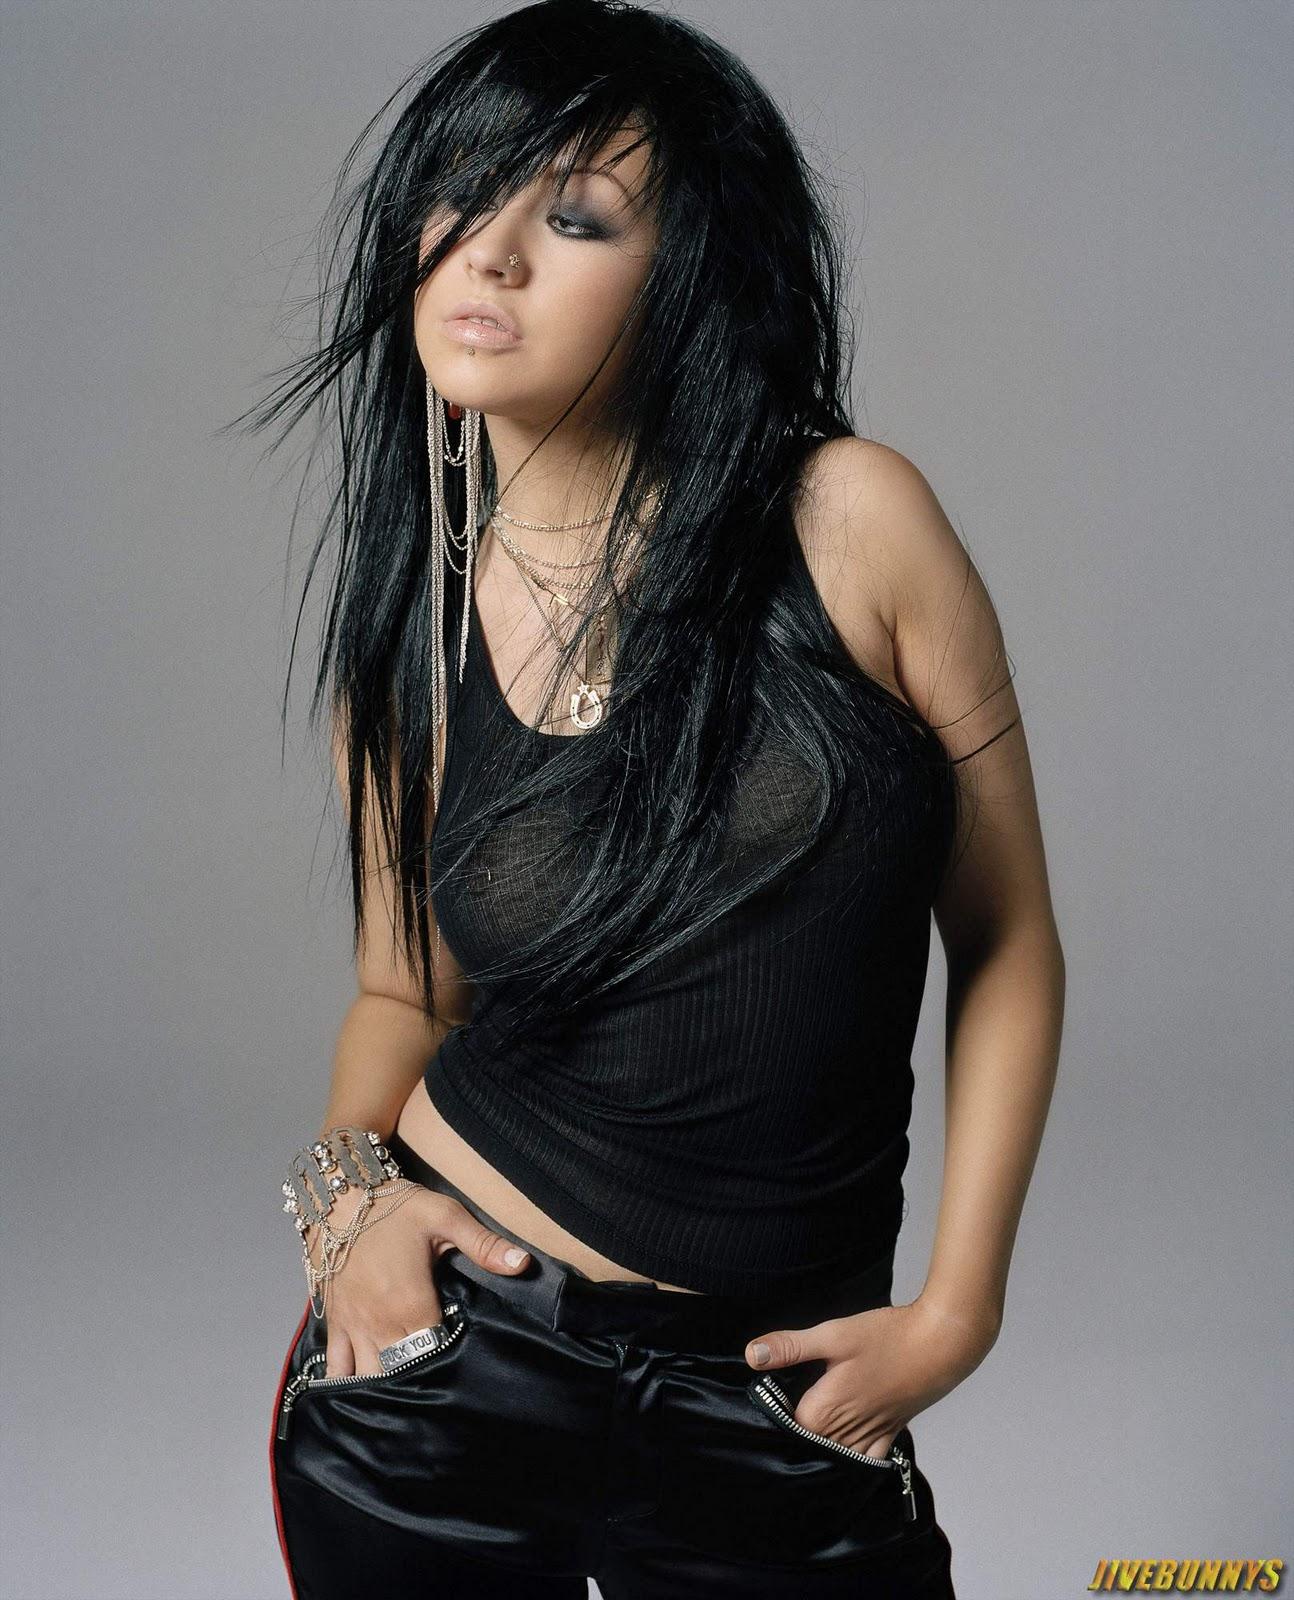 Christina cum fantasy aguilera valuable message